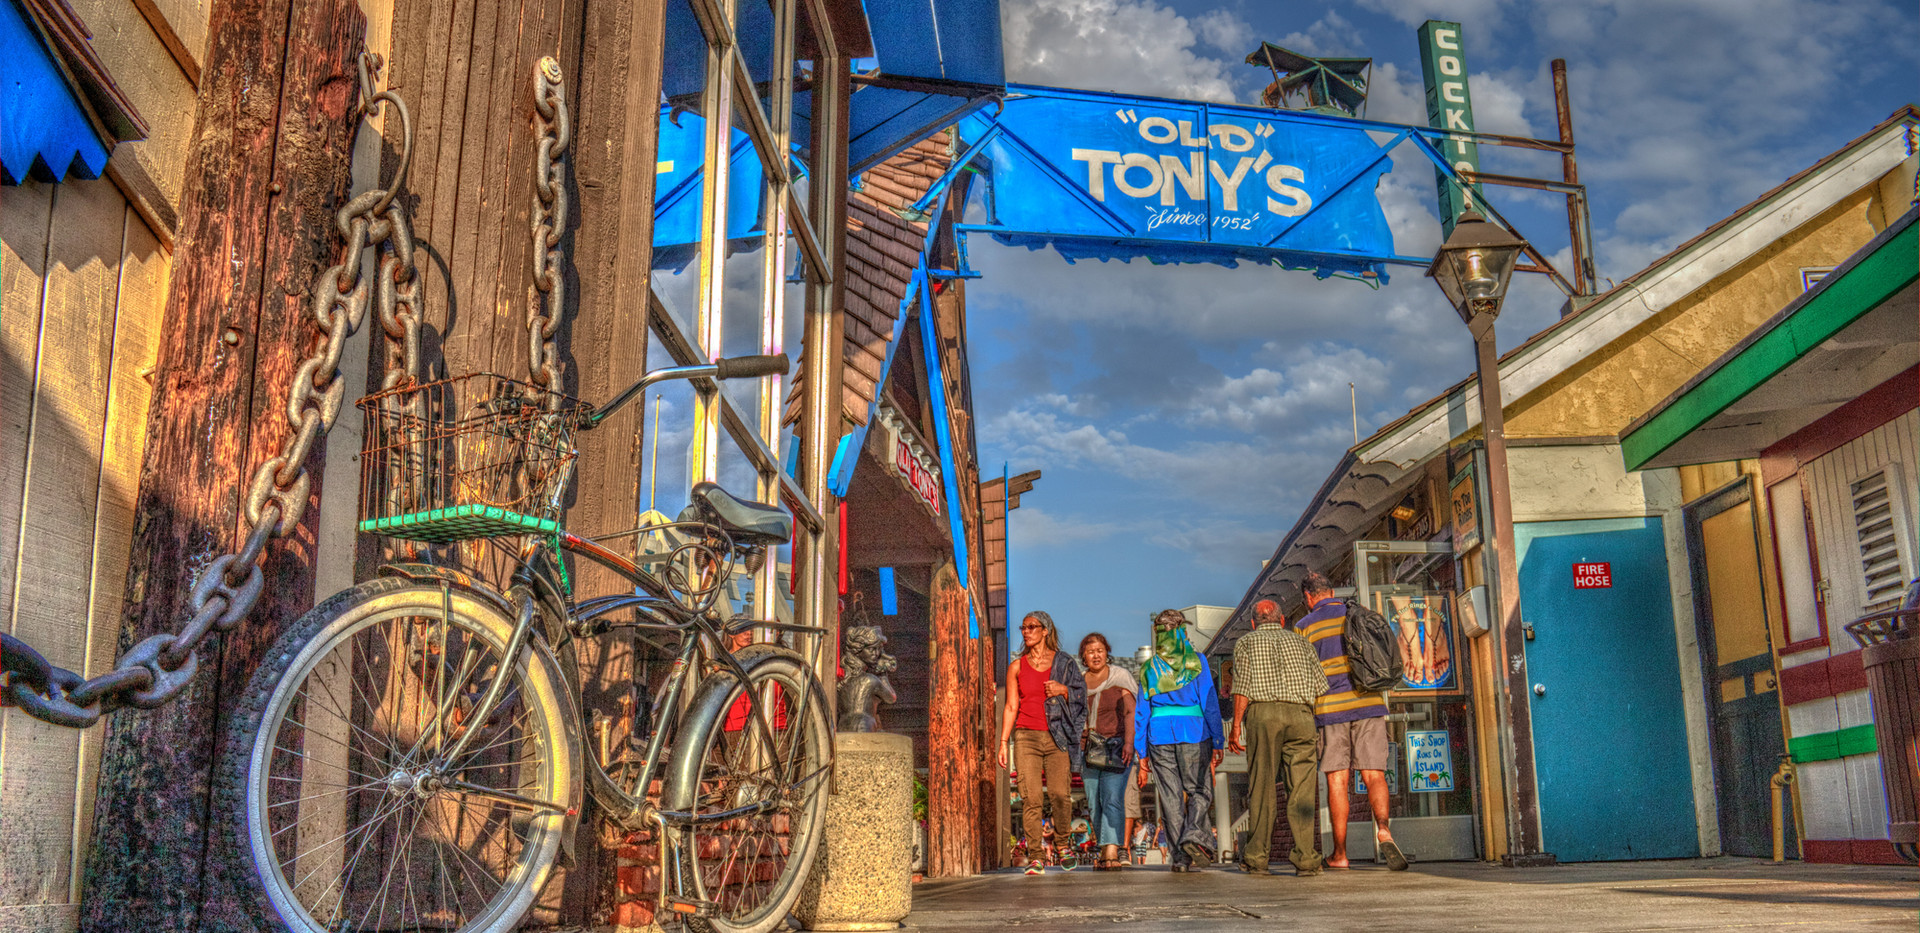 Old Tony's On the Pier 07-30-15